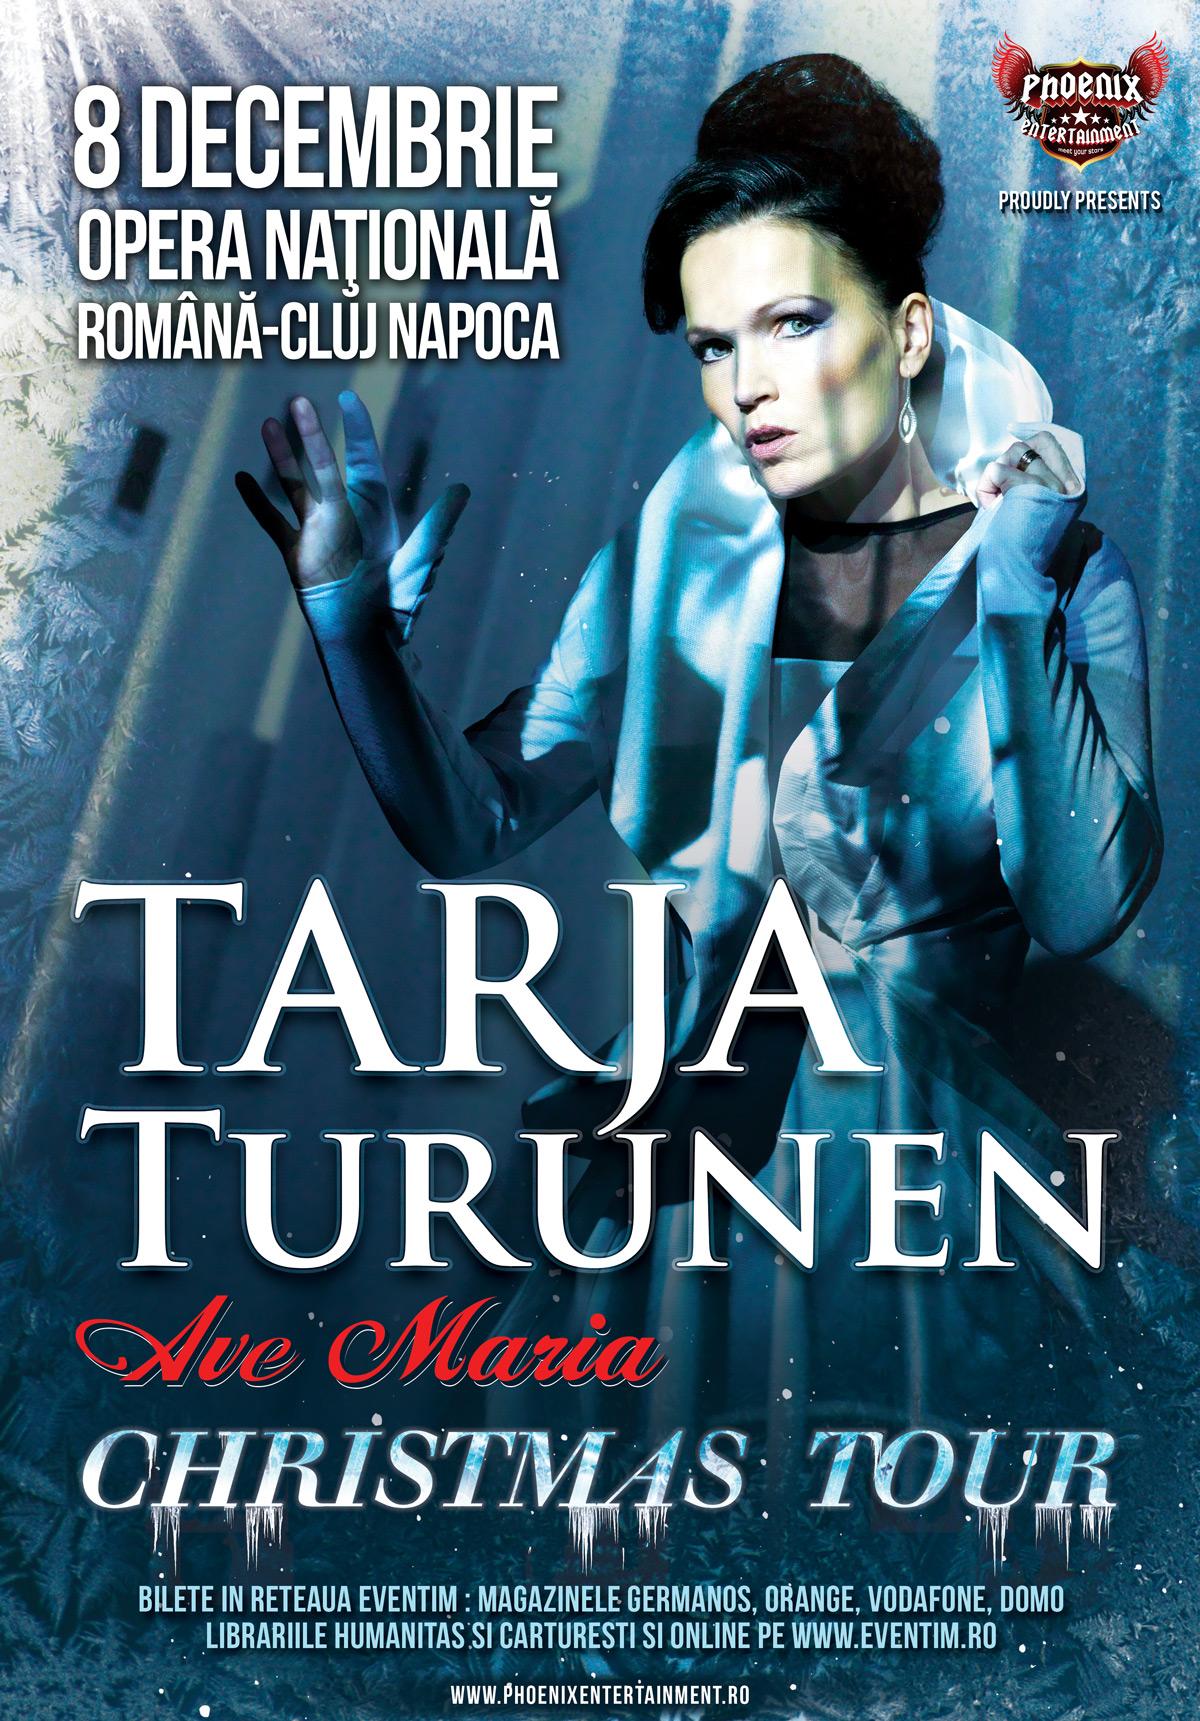 Afiș Concert Tarja Turunen Cluj Napoca 2015